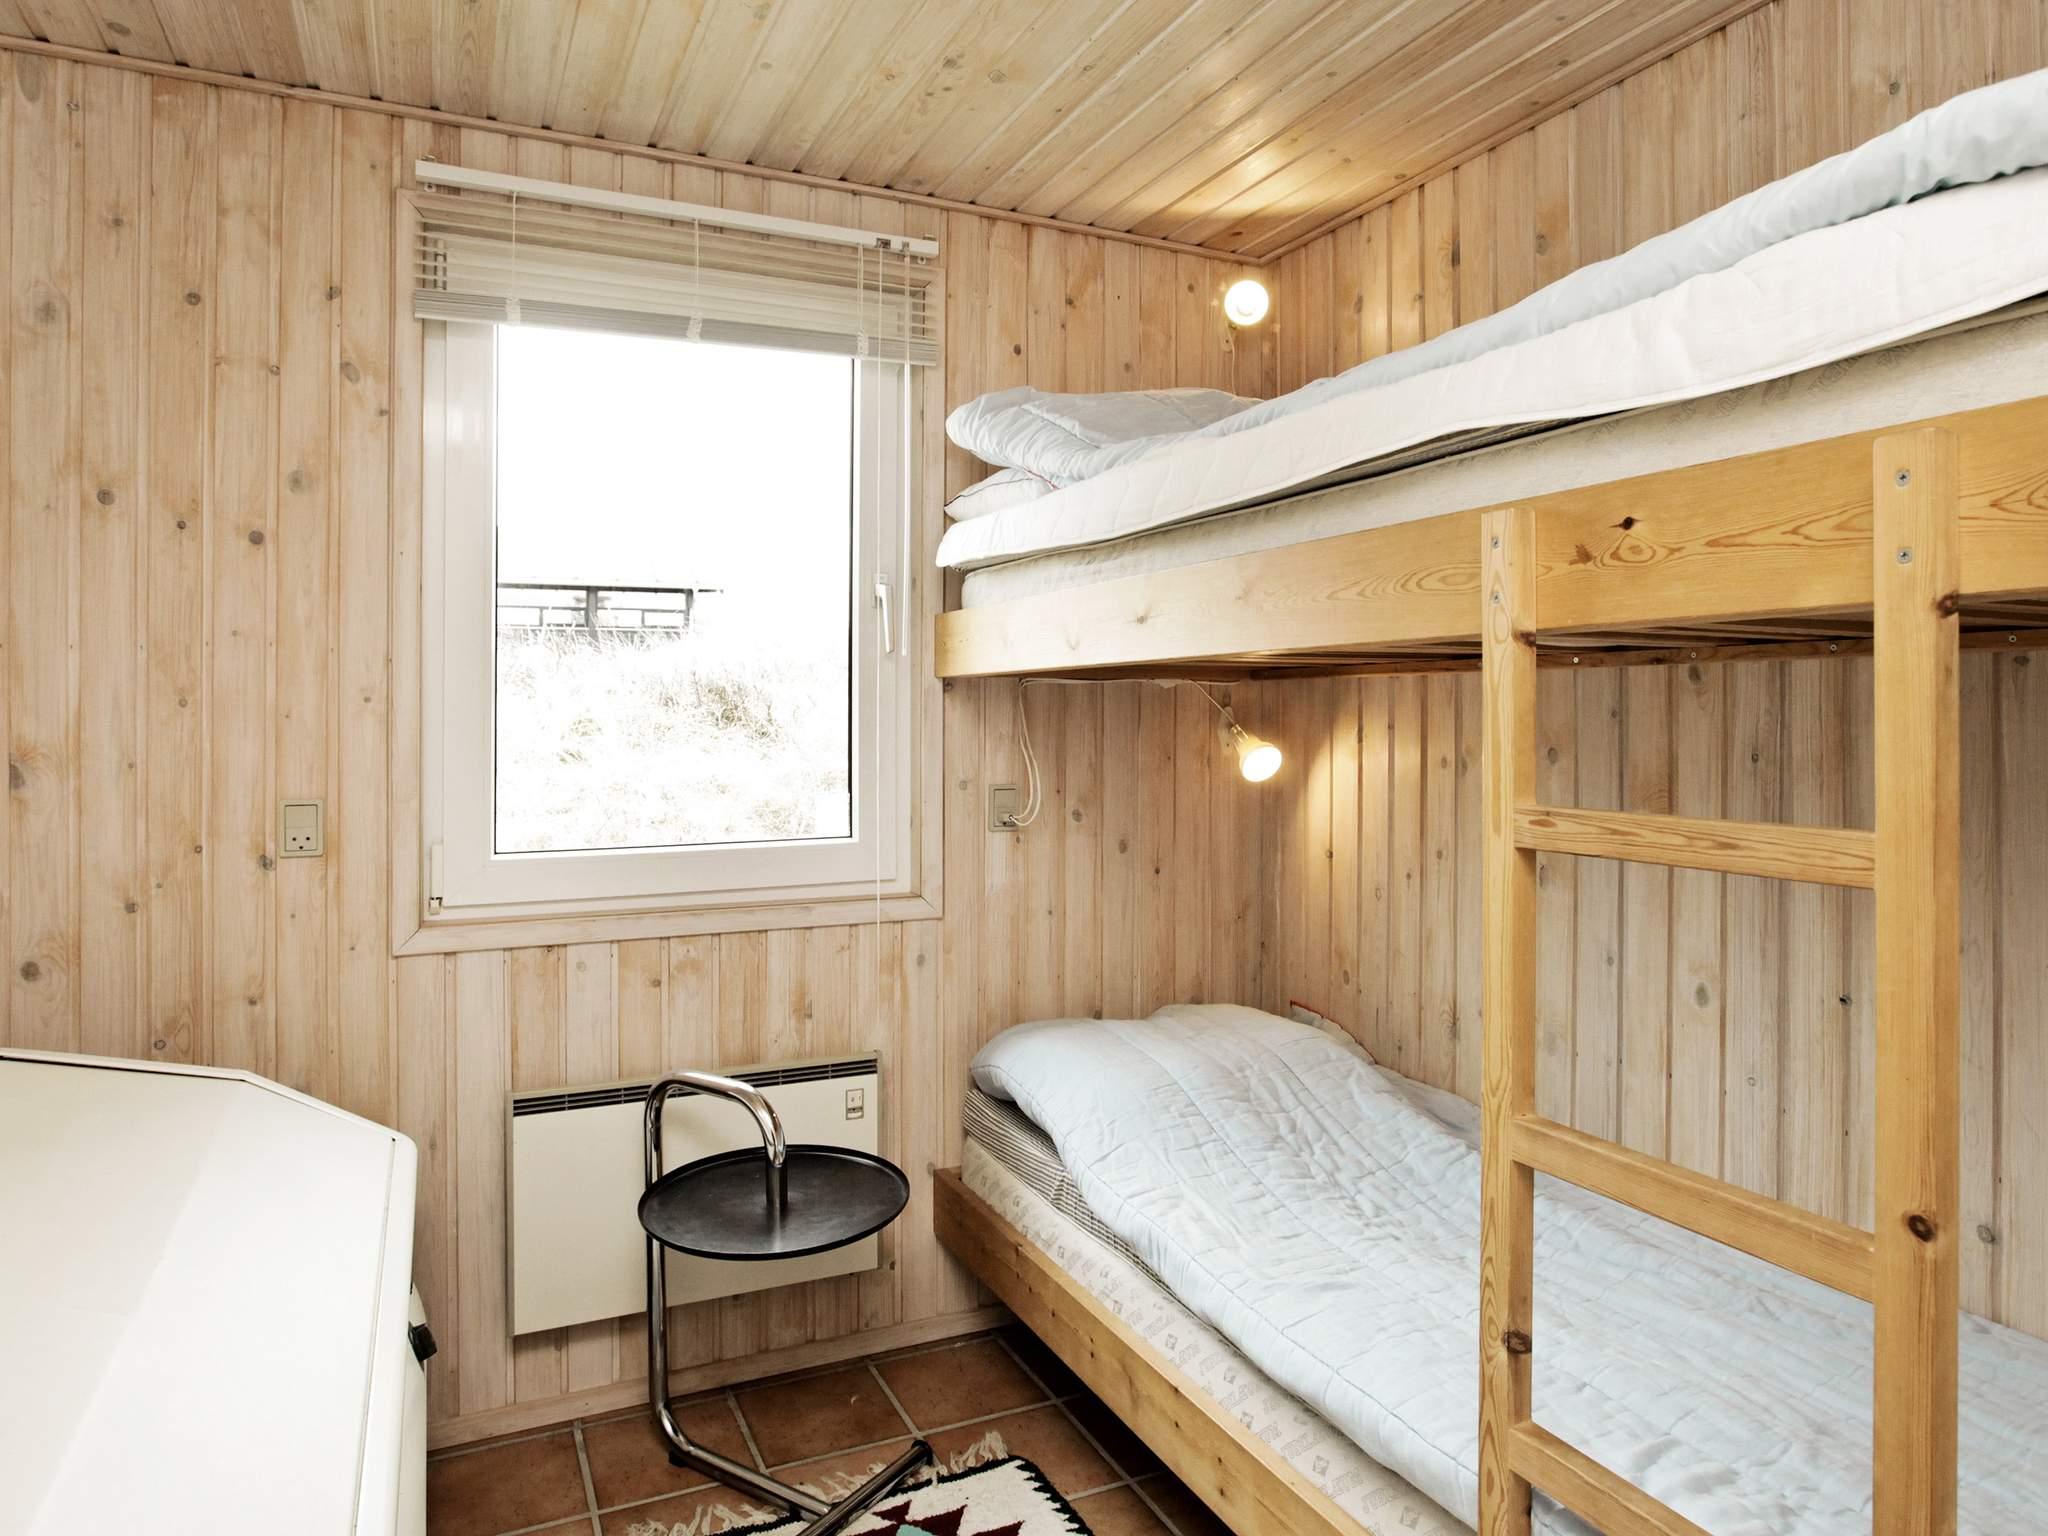 Ferienhaus Tversted (82208), Tversted, , Nordwestjütland, Dänemark, Bild 9